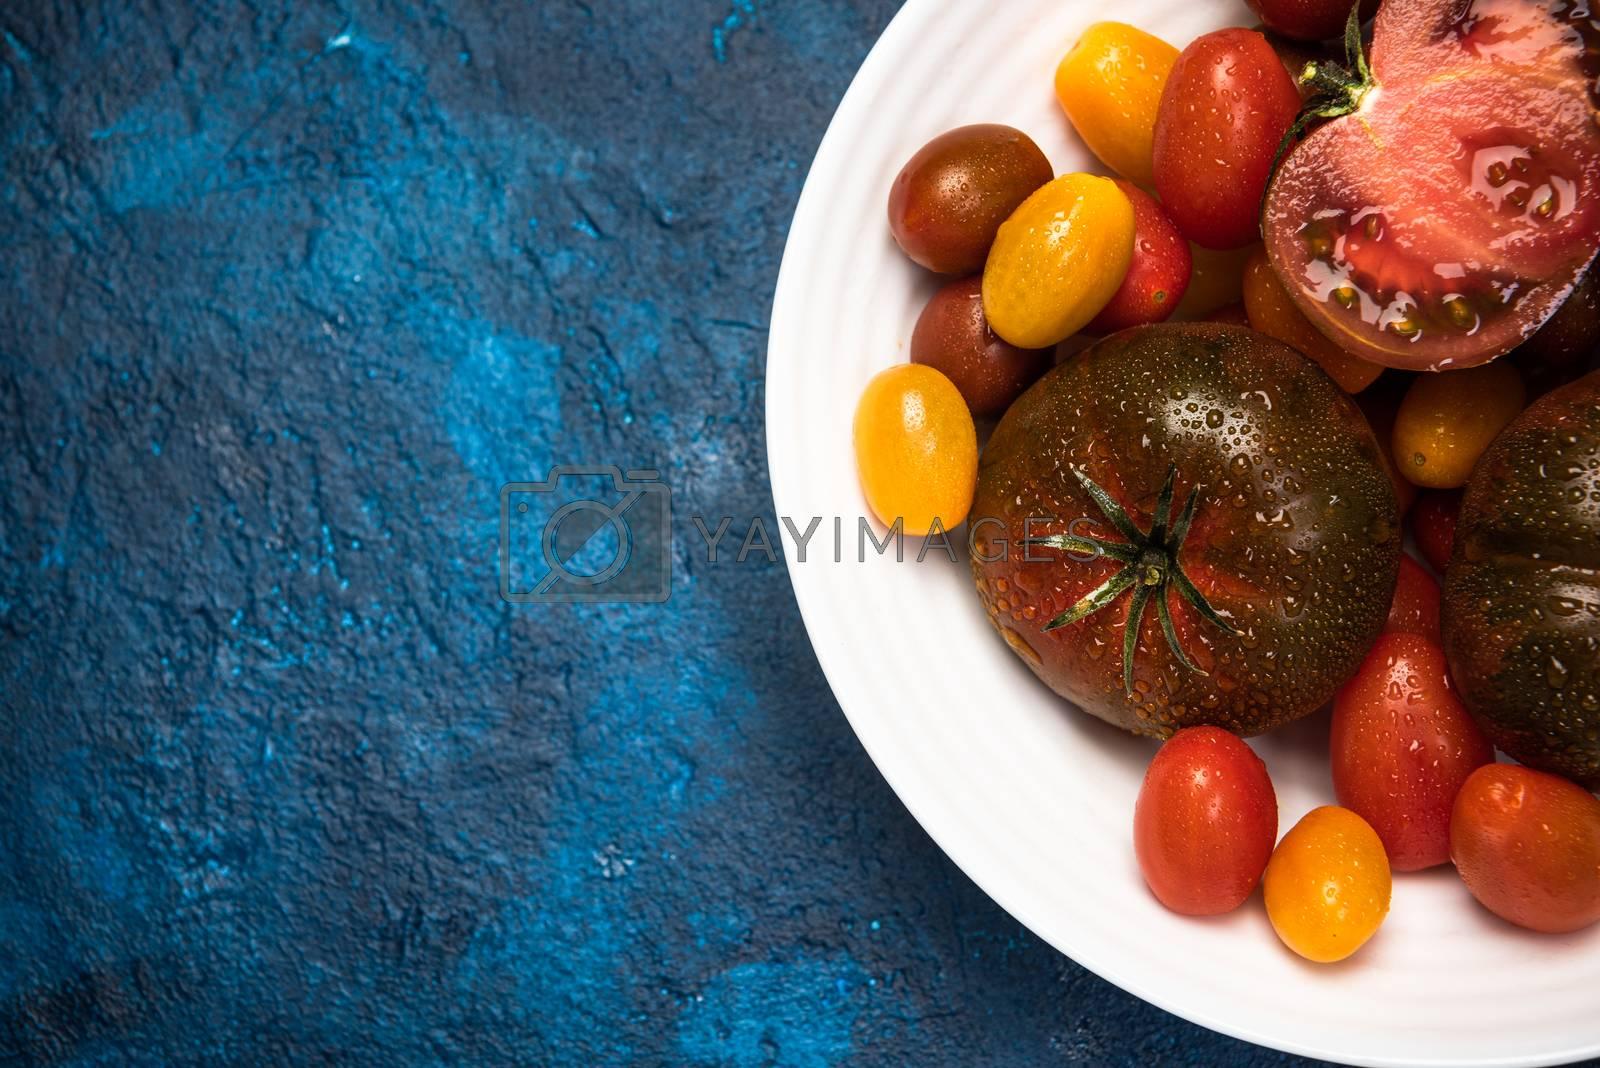 Vibrant Organic Tomatoes on Plate. Market Fresh Vegan Food. Plant Food Diet.